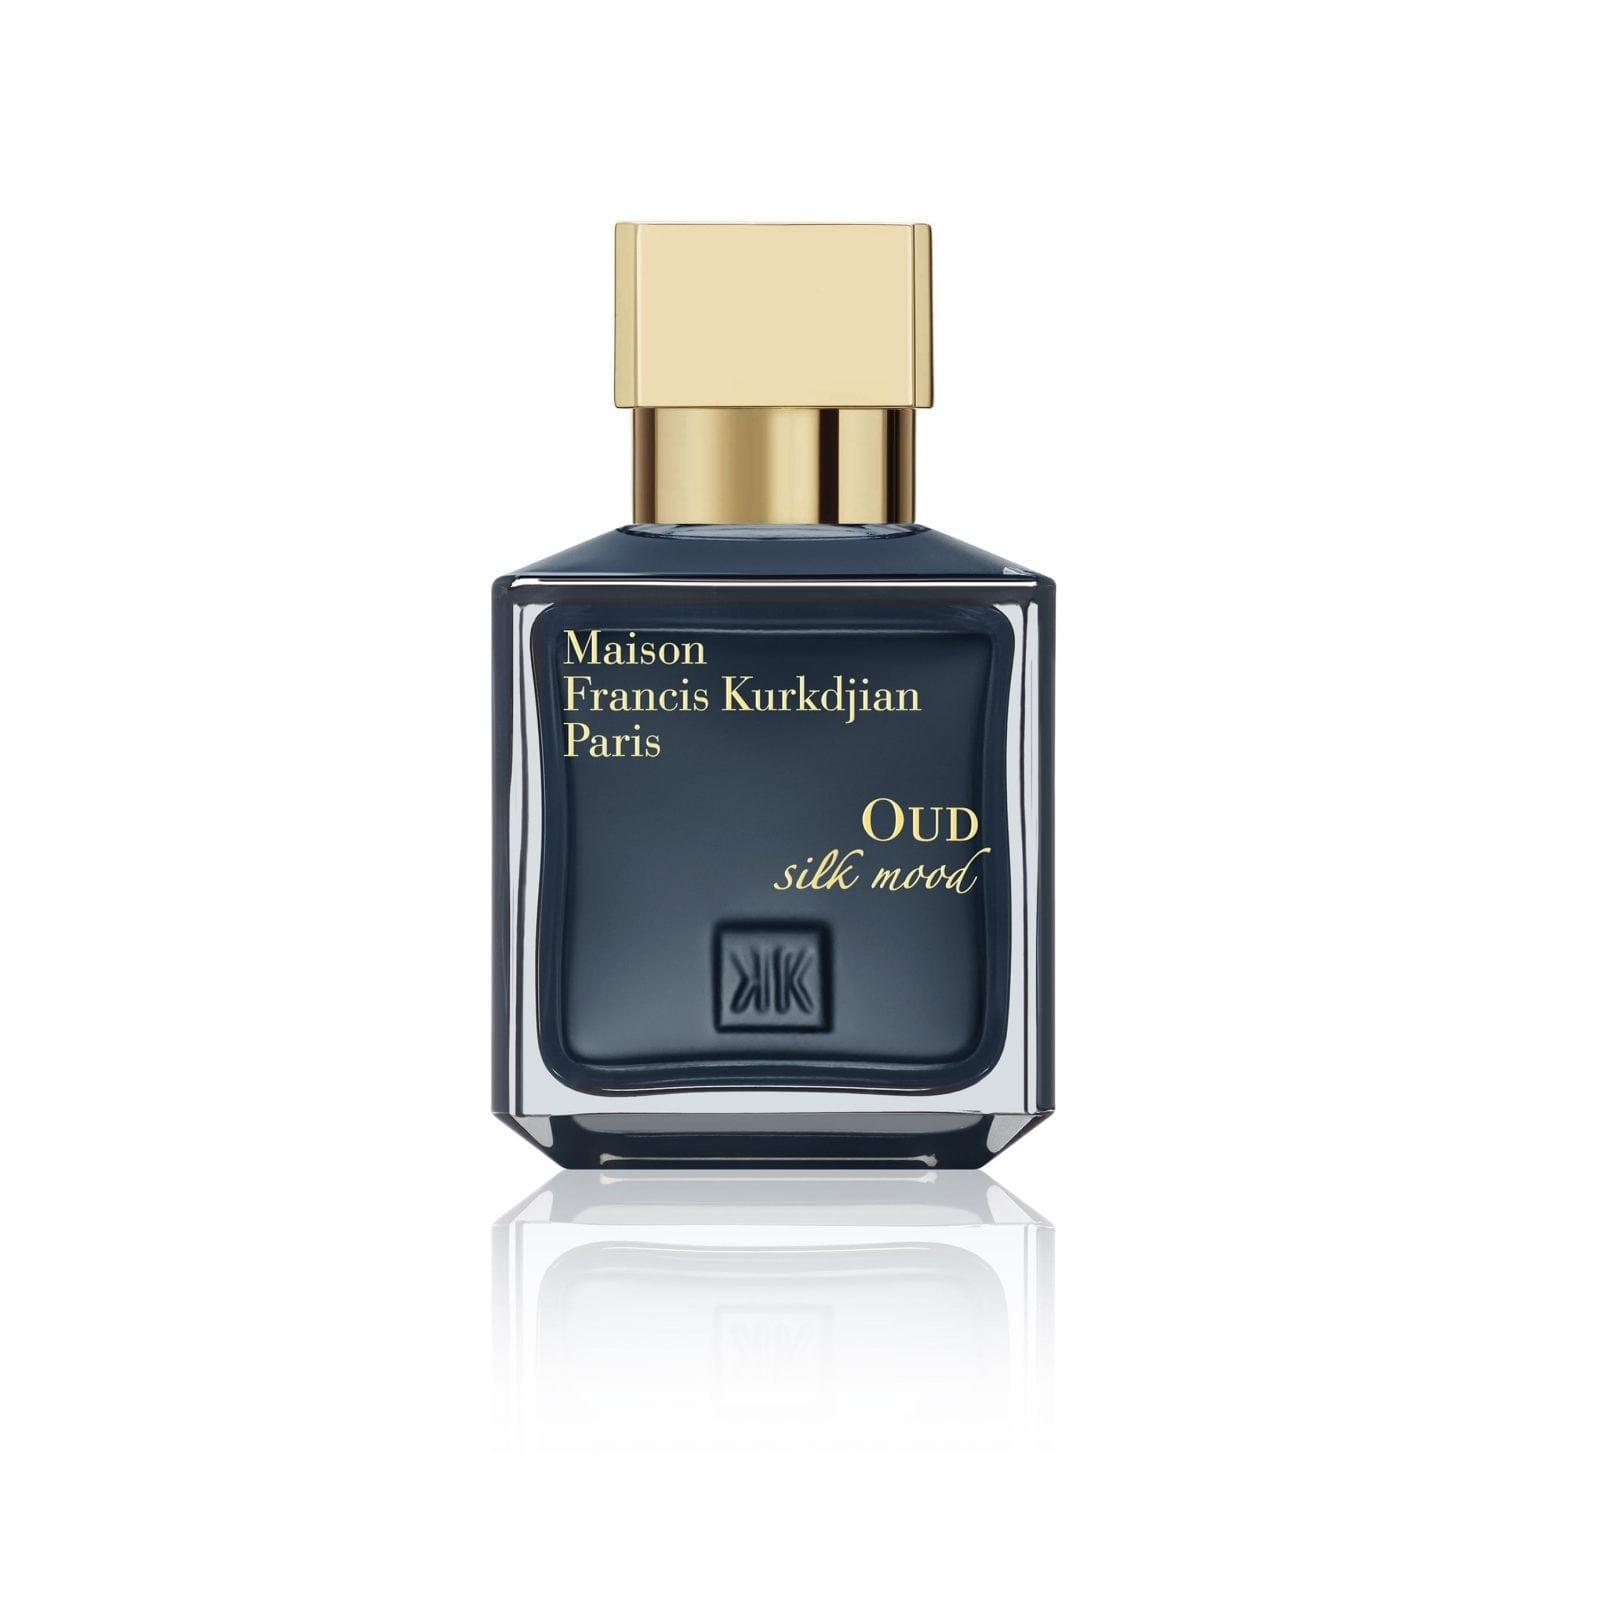 OUD silk mood edp bottle - Despre arta parfumeriei de lux franceze, cu Marc Chaya, CEO Maison Francis Kurkdjian